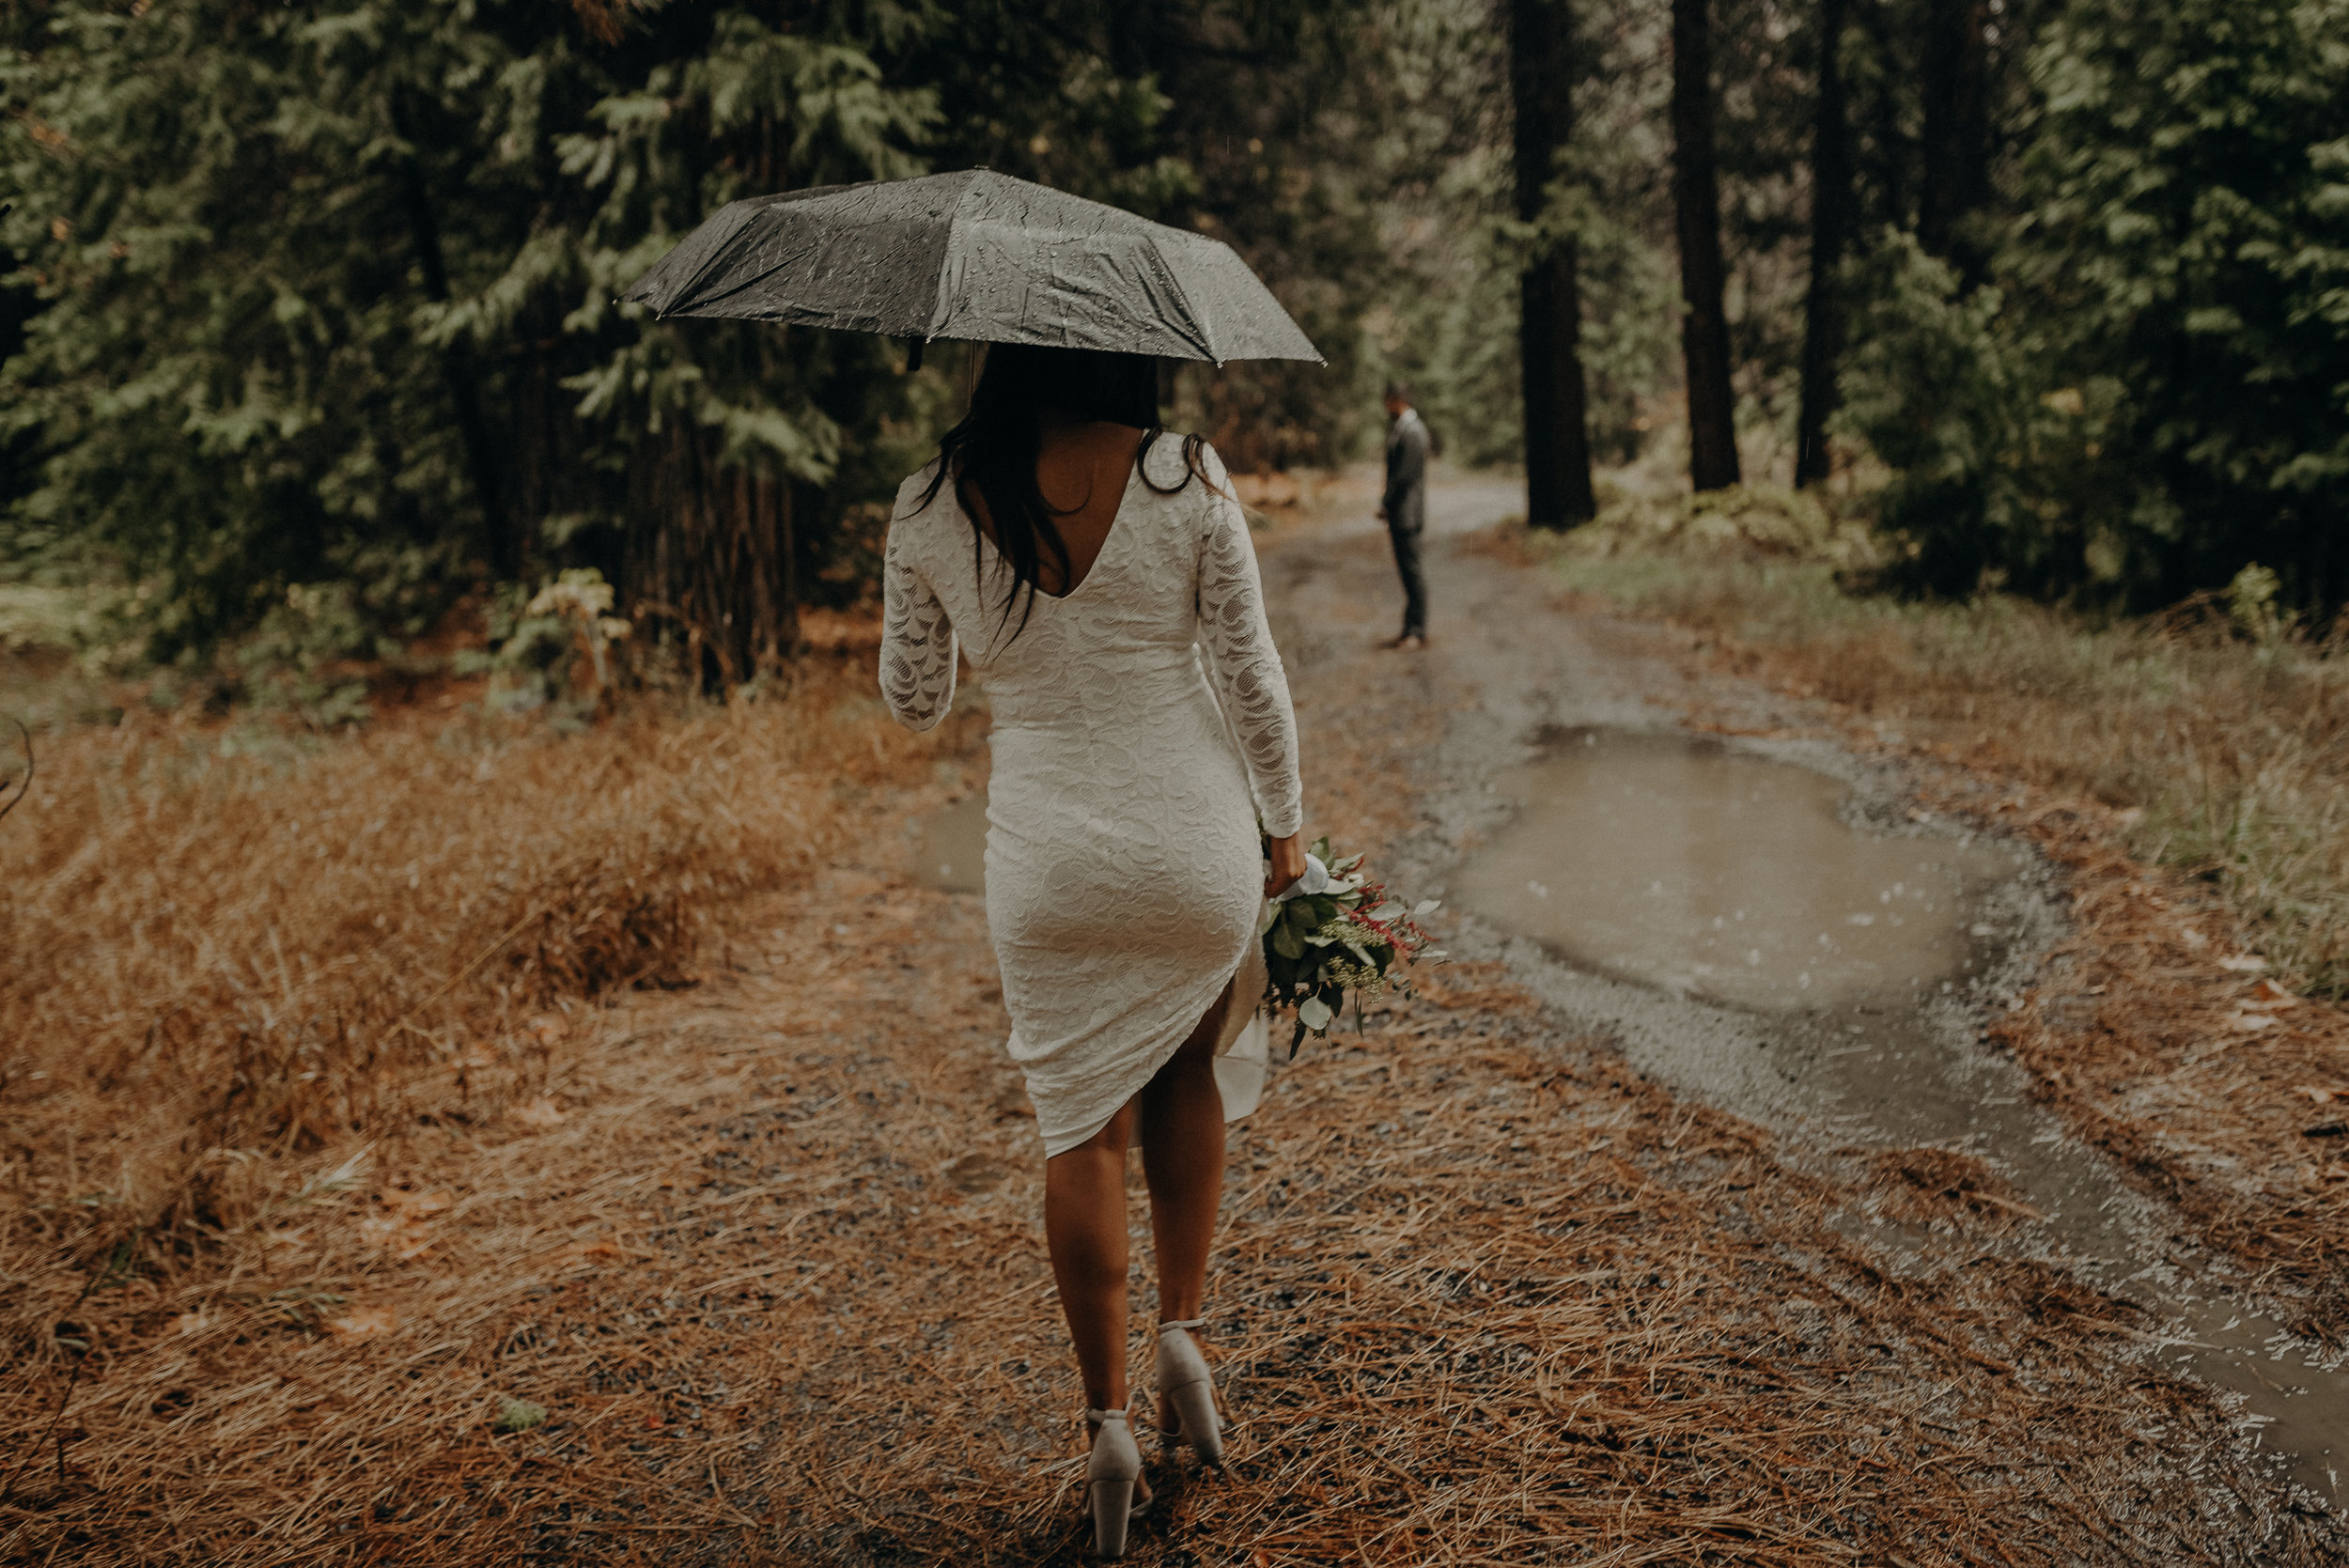 Isaiah + Taylor Photography - Yosemite Elopement - Los Angeles Wedding Photographer-10.jpg